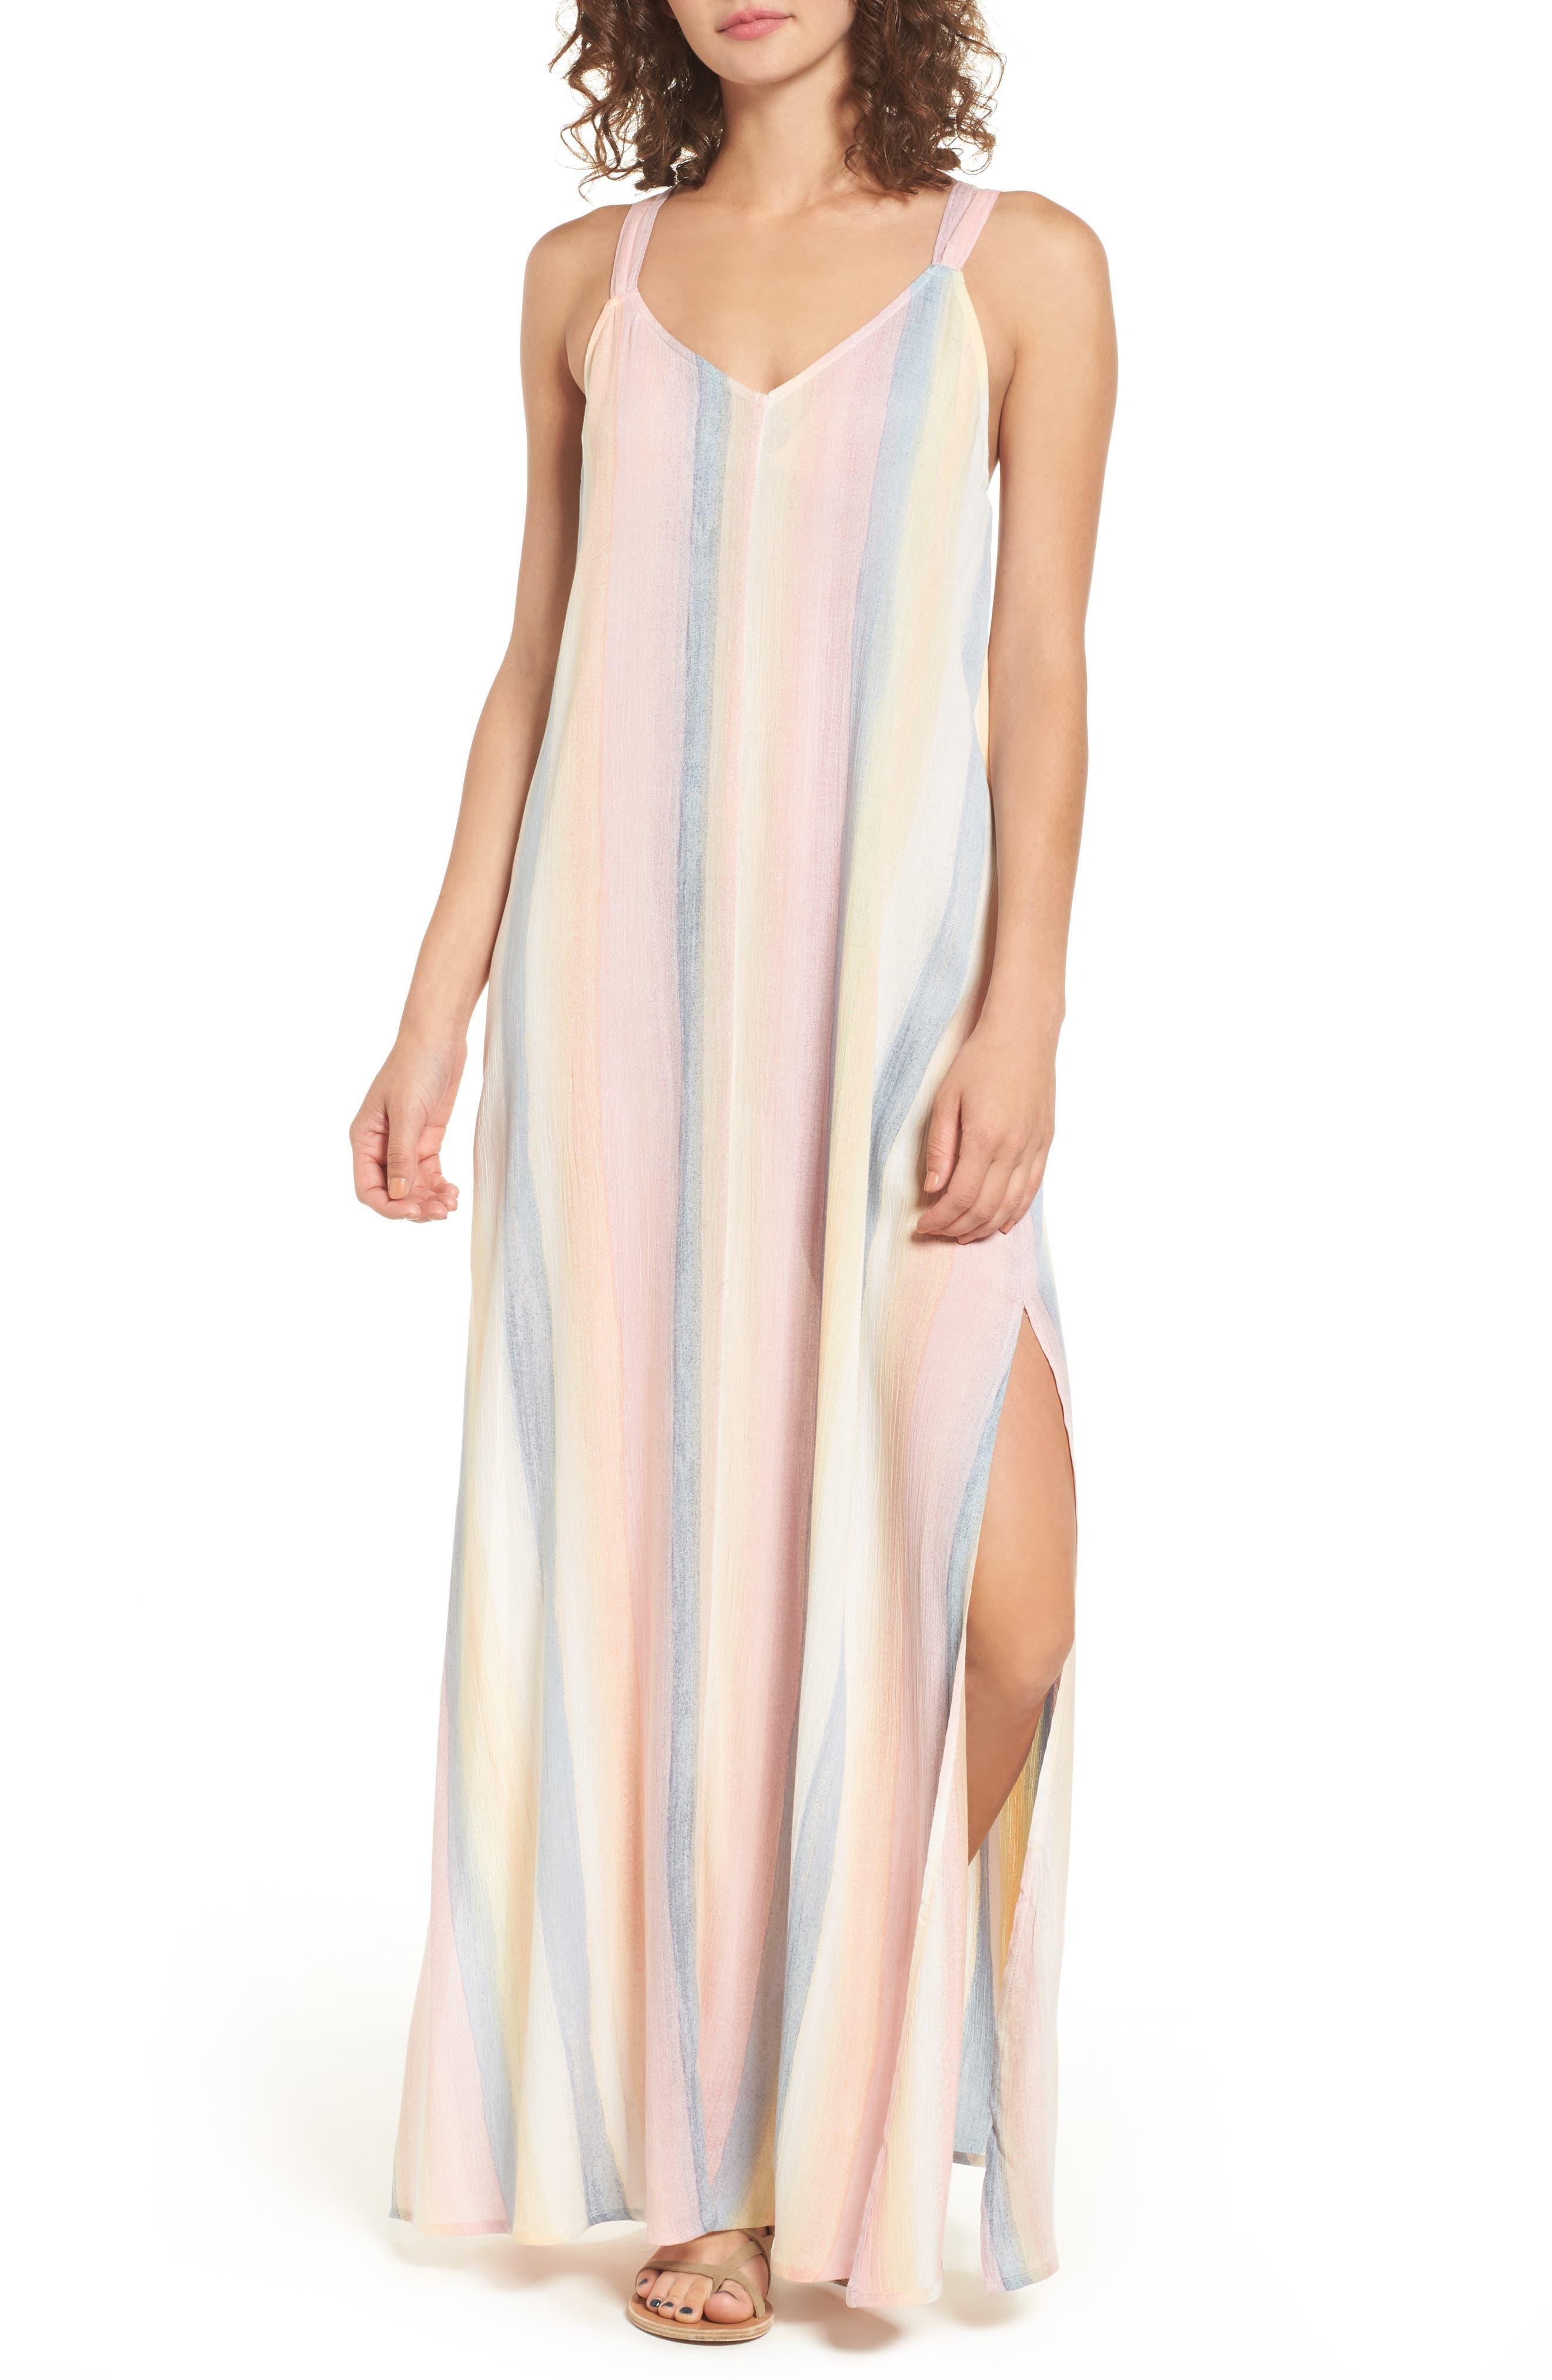 Alternate Image 1 Selected - Billabong Sky High Maxi Dress